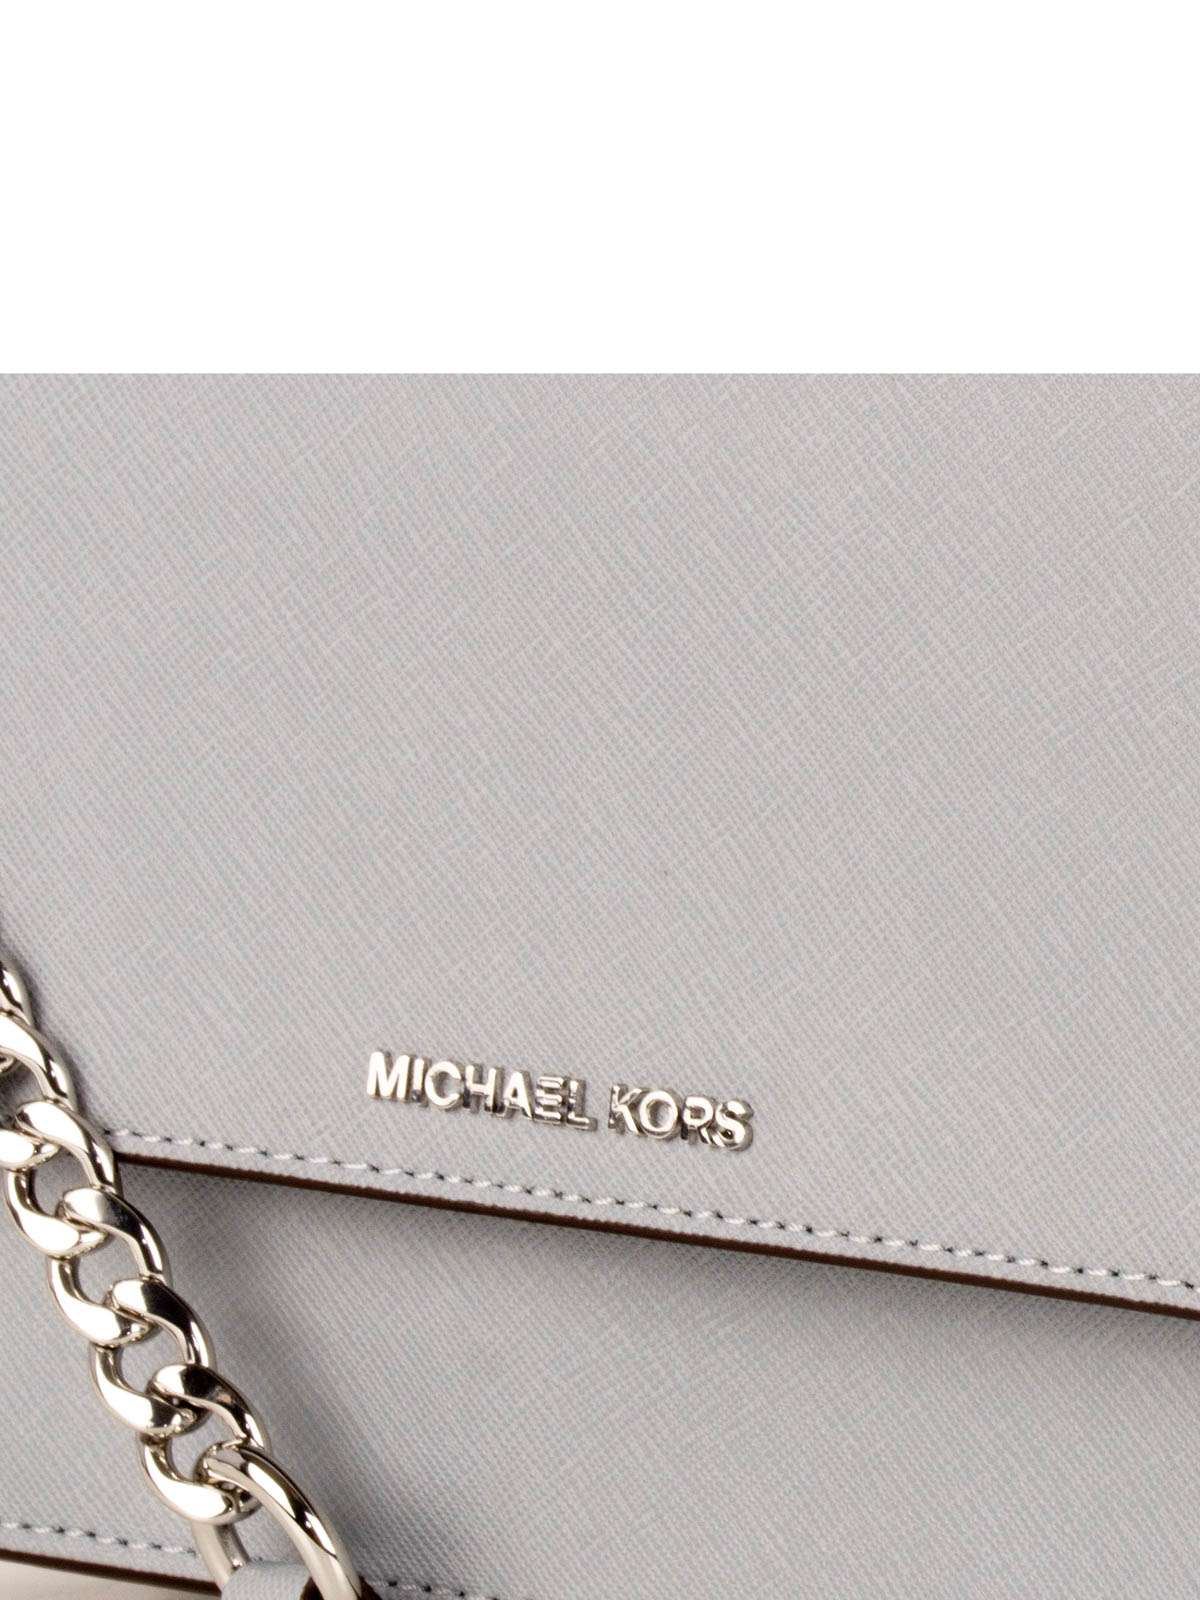 0fbf8a4c96d64f iKRIX MICHAEL KORS: cross body bags - Daniela small crossbody. Daniela  small crossbody shop online: MICHAEL KORS